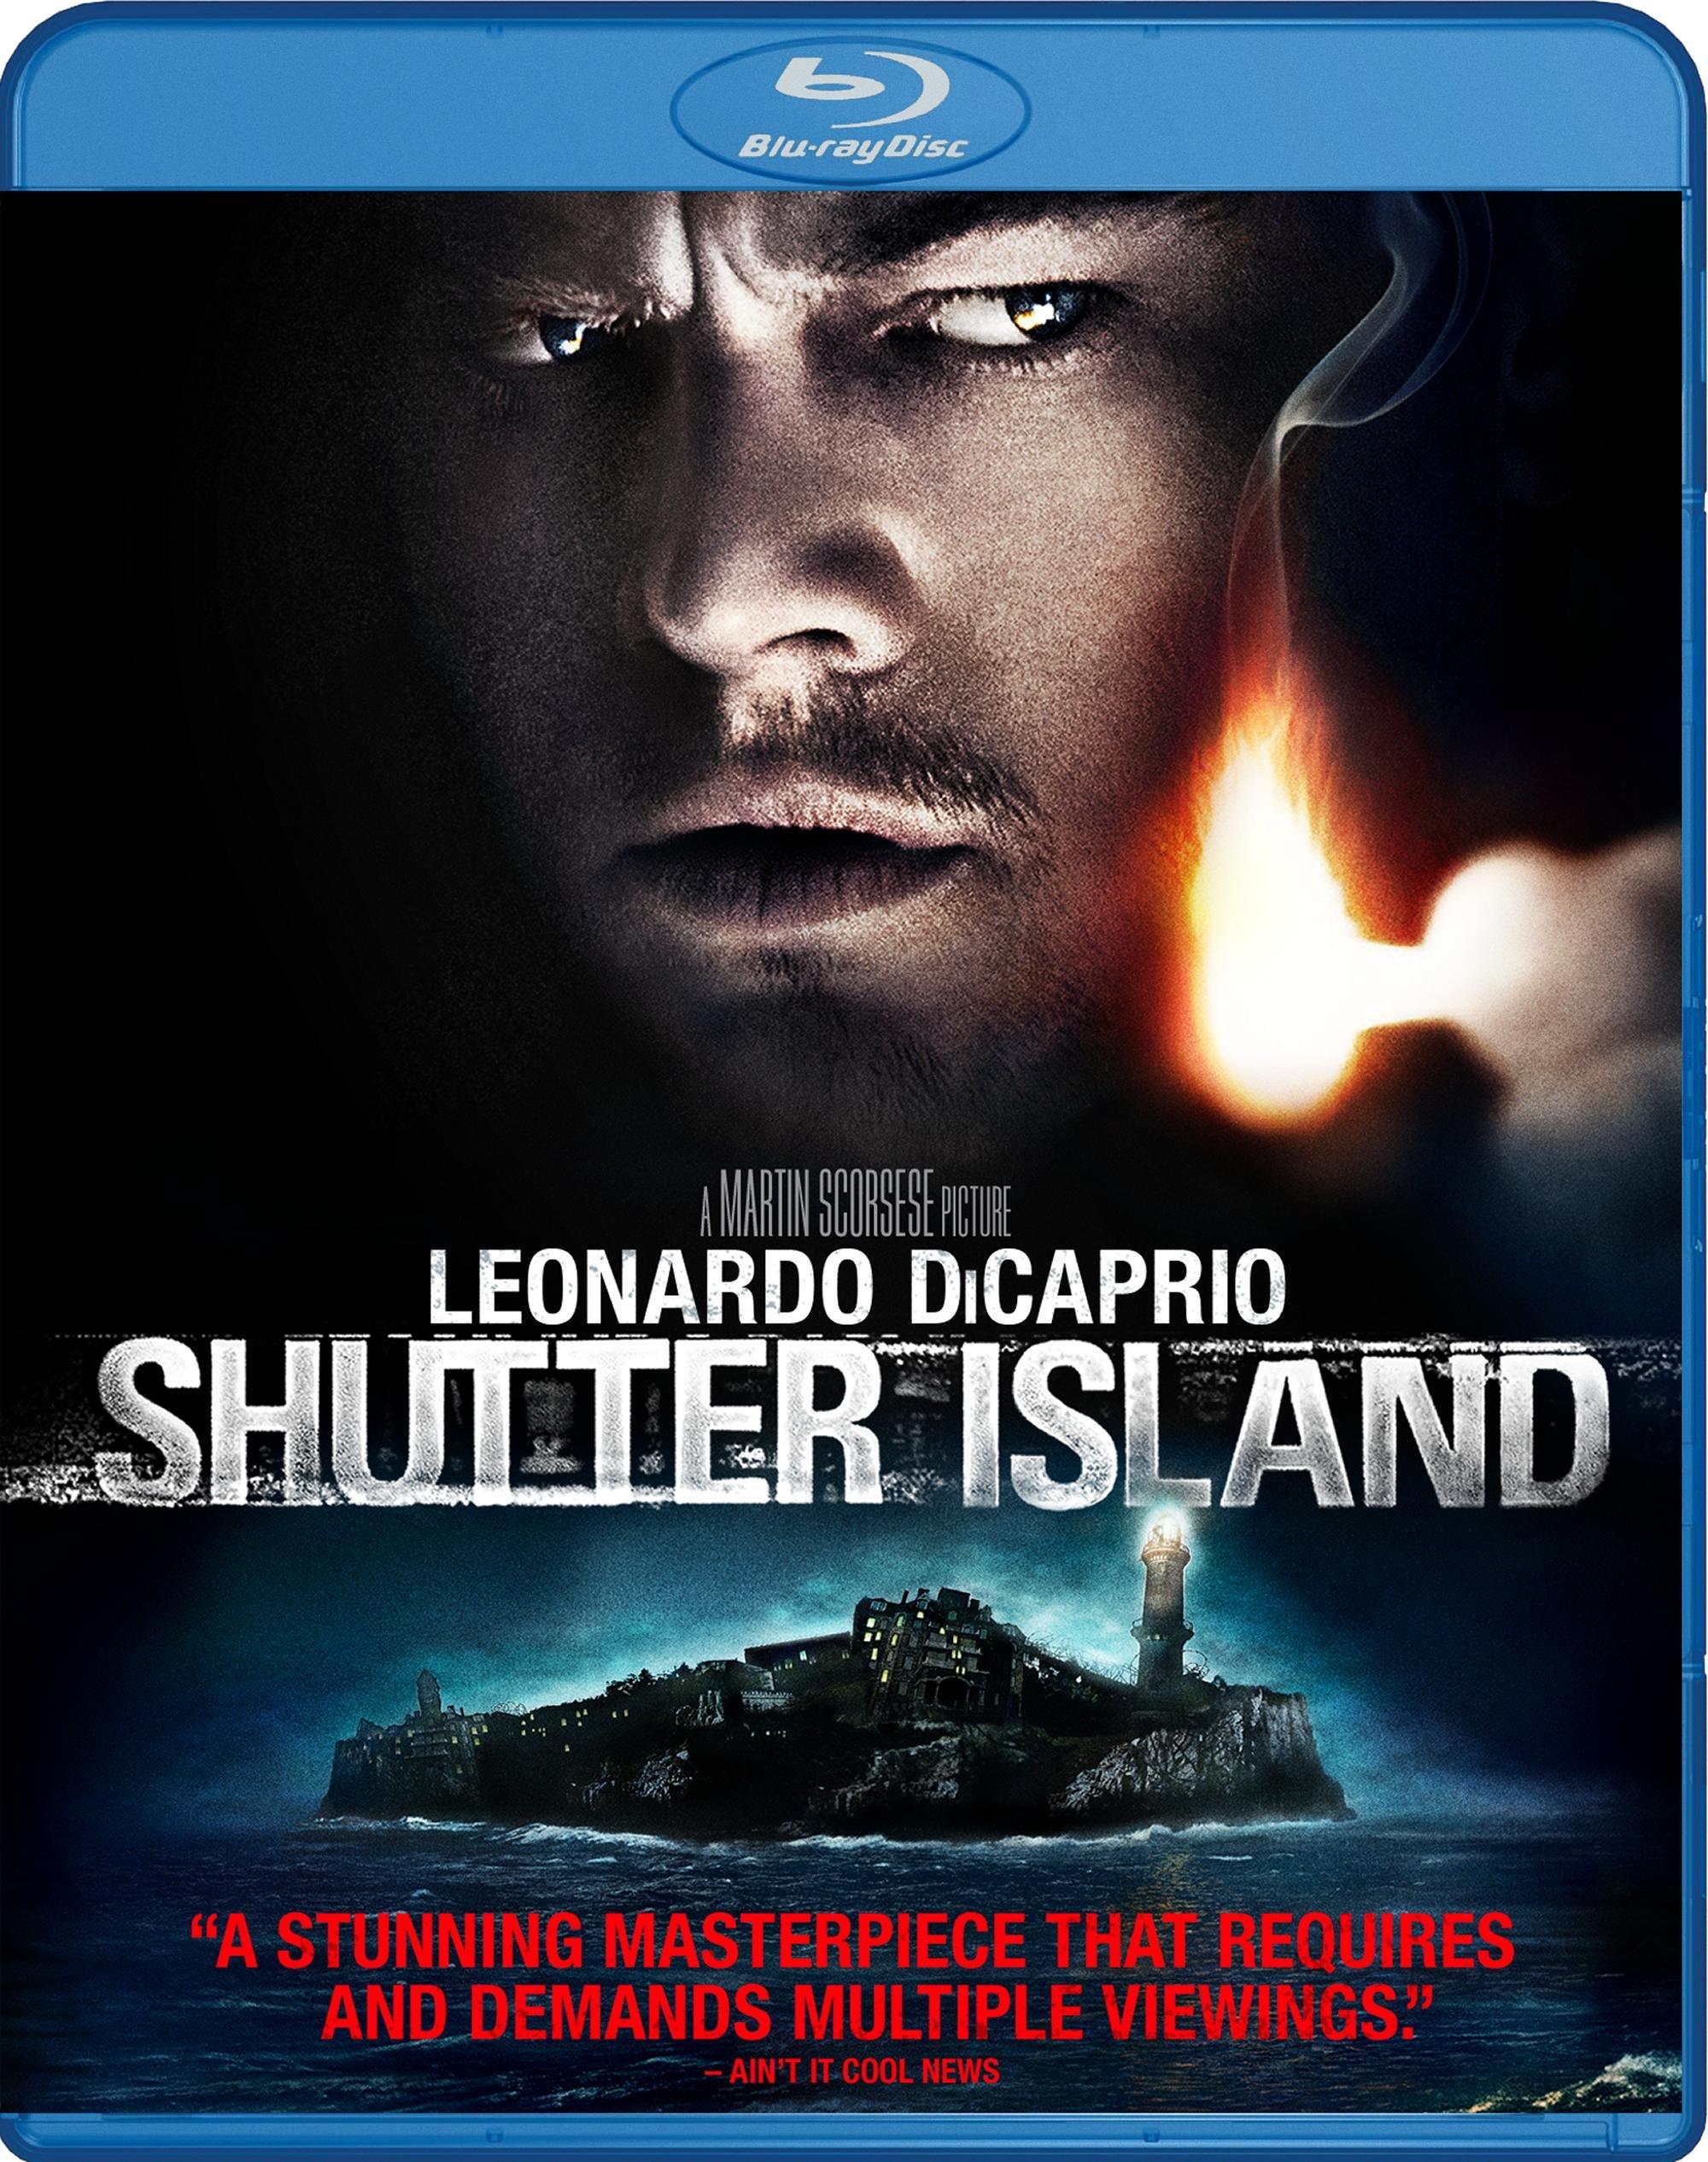 Shutter Island DVD Release Date June 8 2010